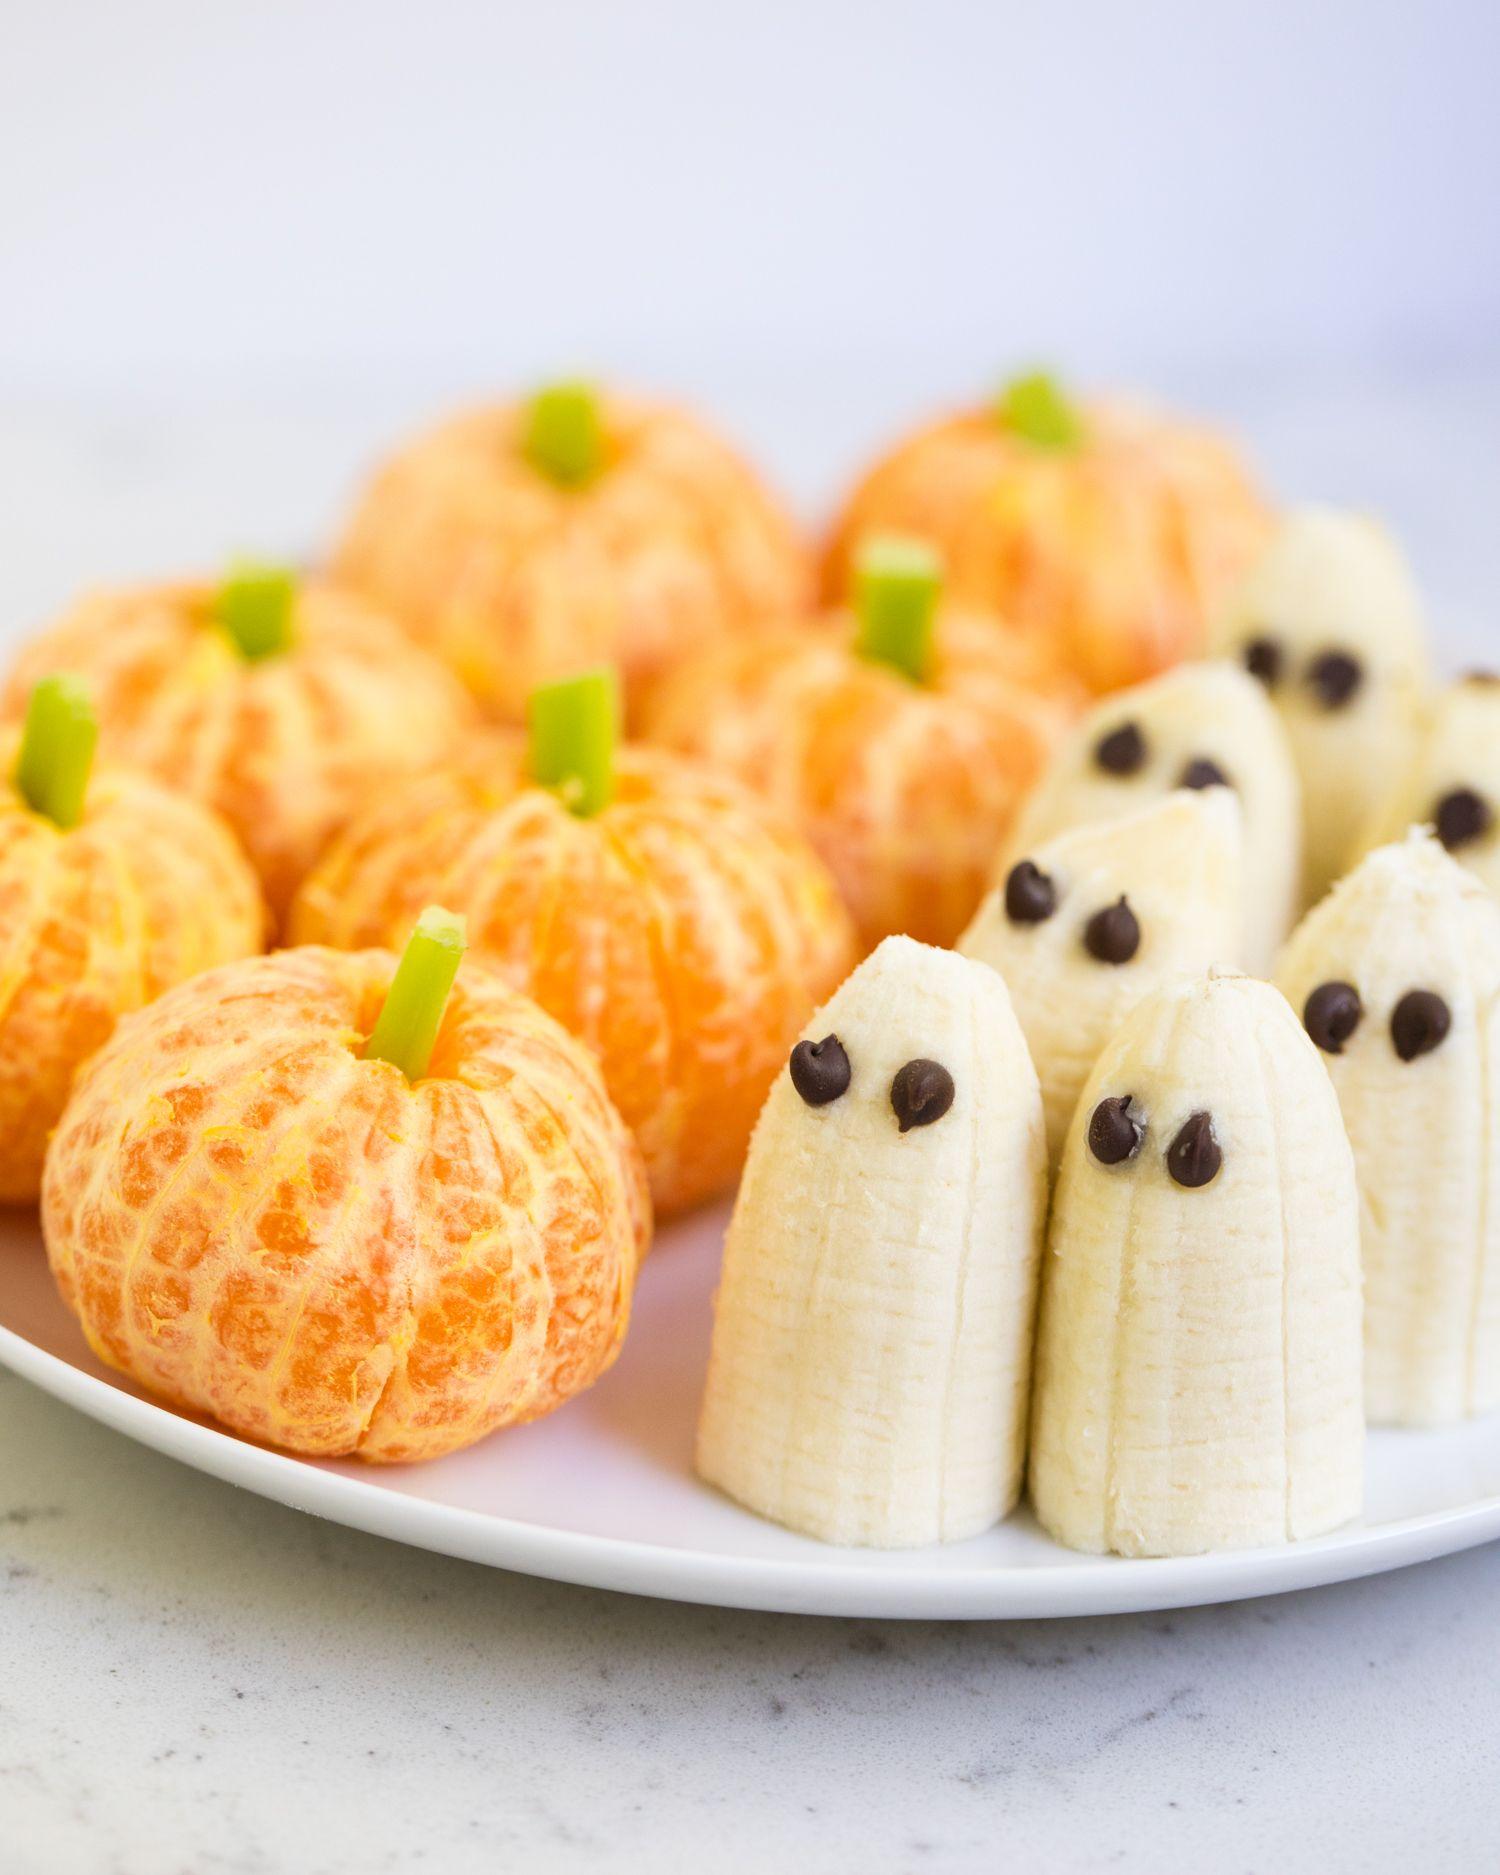 Easy Halloween Snacks.Halloween Snack Ideas For School I Heart Nap Time Kids Halloween Food Easy Halloween Snacks Halloween Food For Party